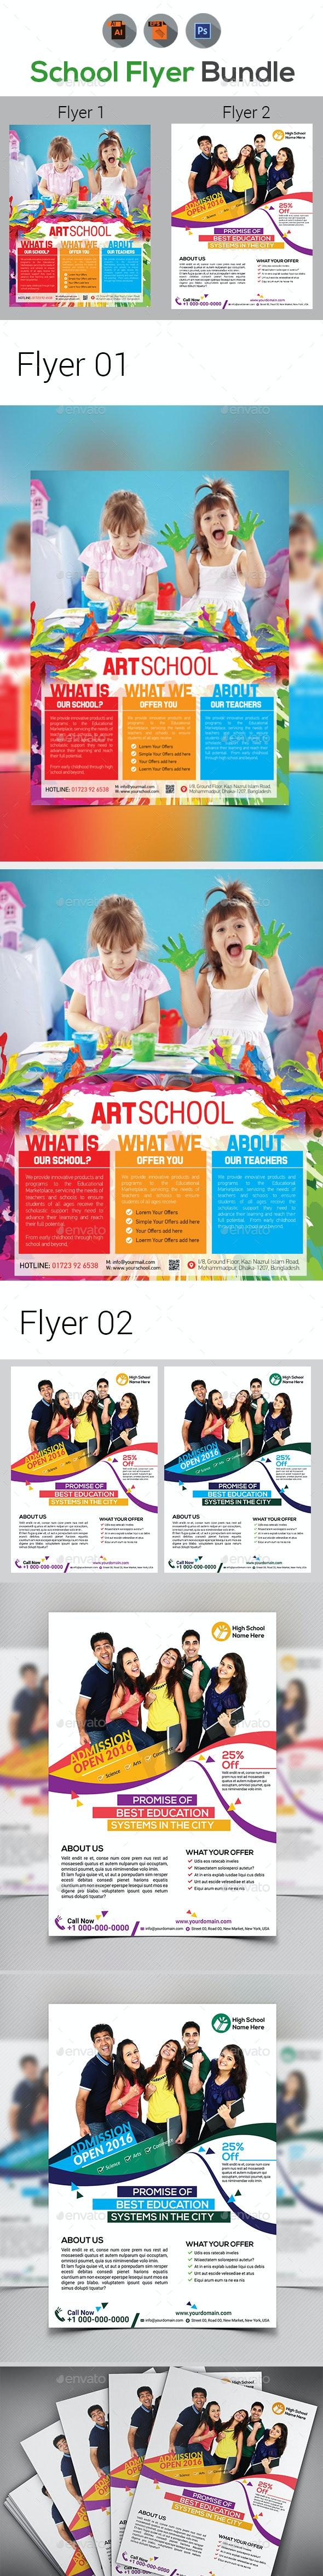 School Flyer Bundle - Corporate Flyers